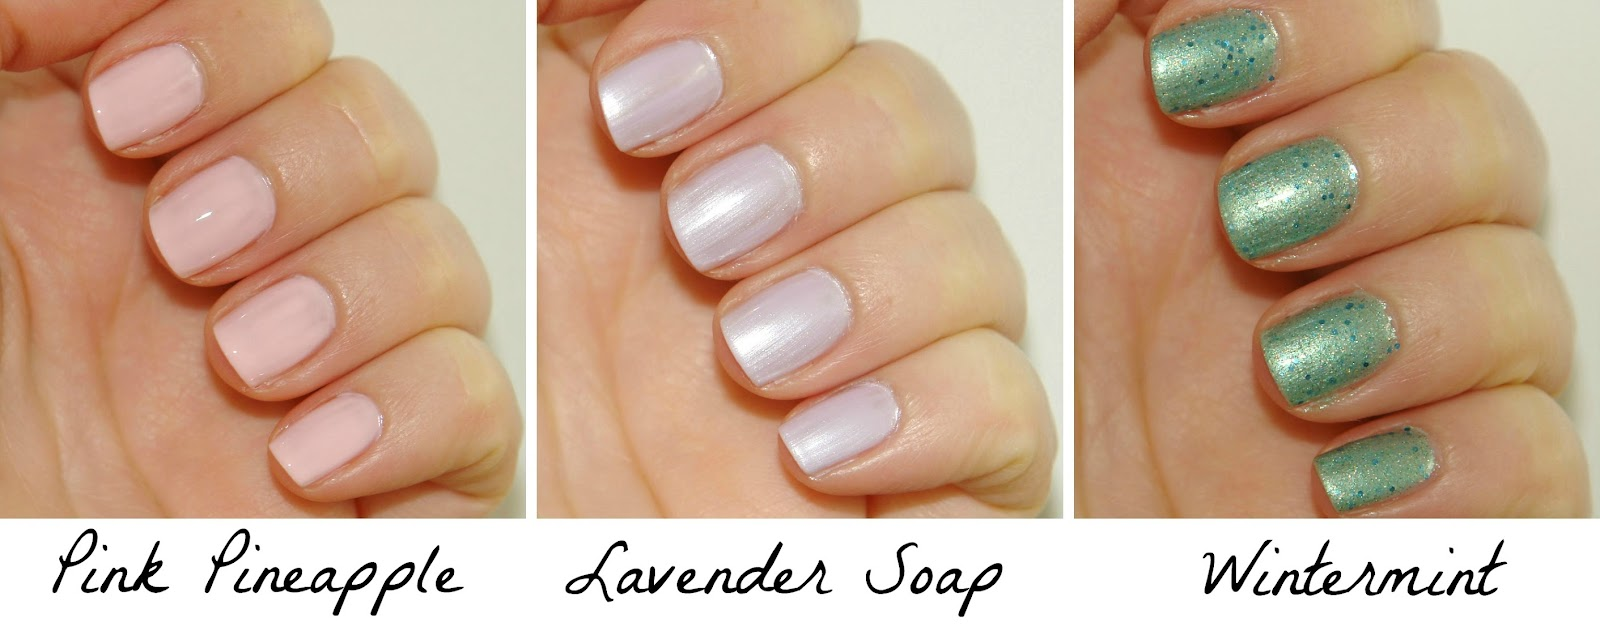 My Revlon Parfumerie nail polishes, Pink Pineapple, Lavender Soap, Wintermint, nail polish, nails, Revlon, NOTD, swatches, nail swatches, UK blogger, beauty, nail art